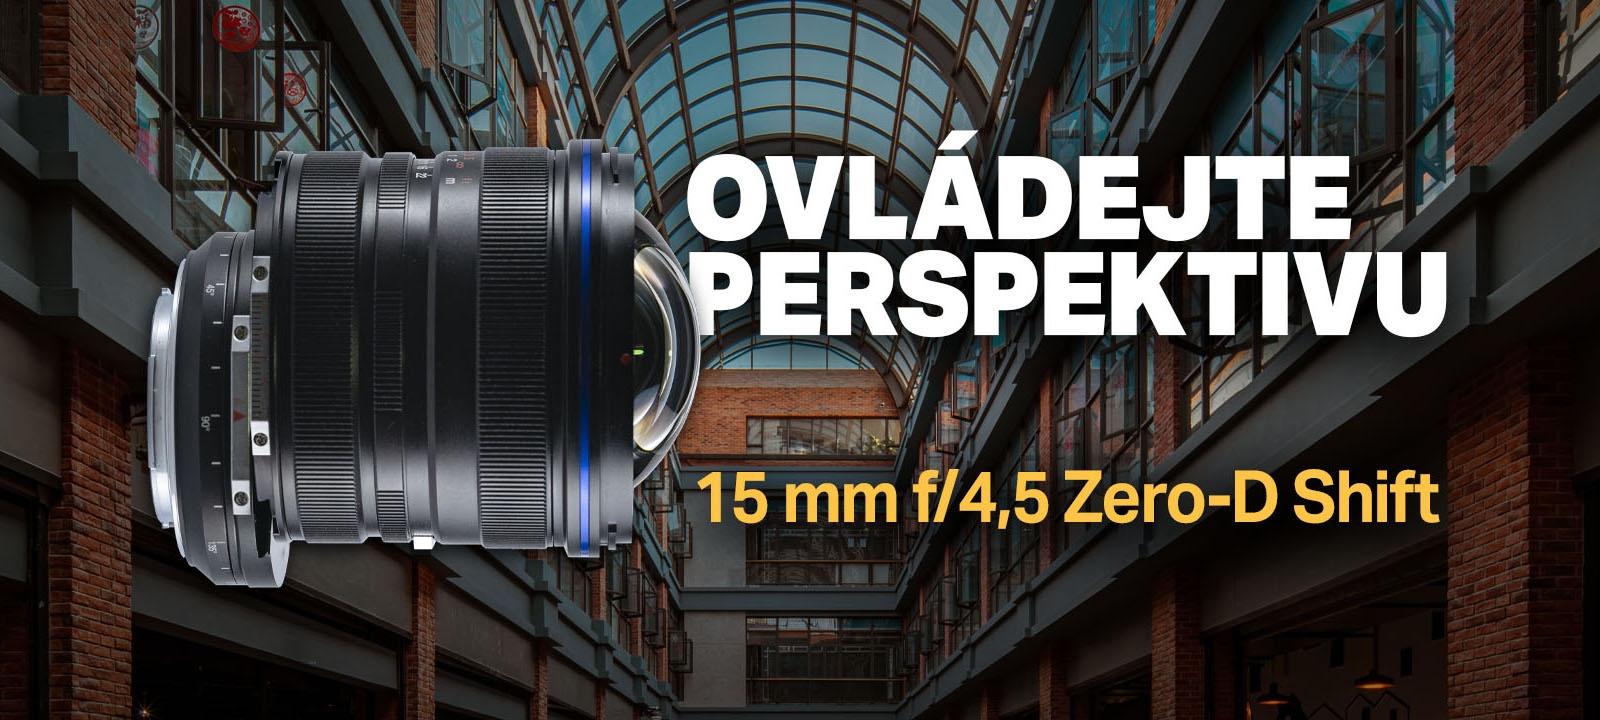 Laowa 15 mm f/4,5 Zero-D Shift